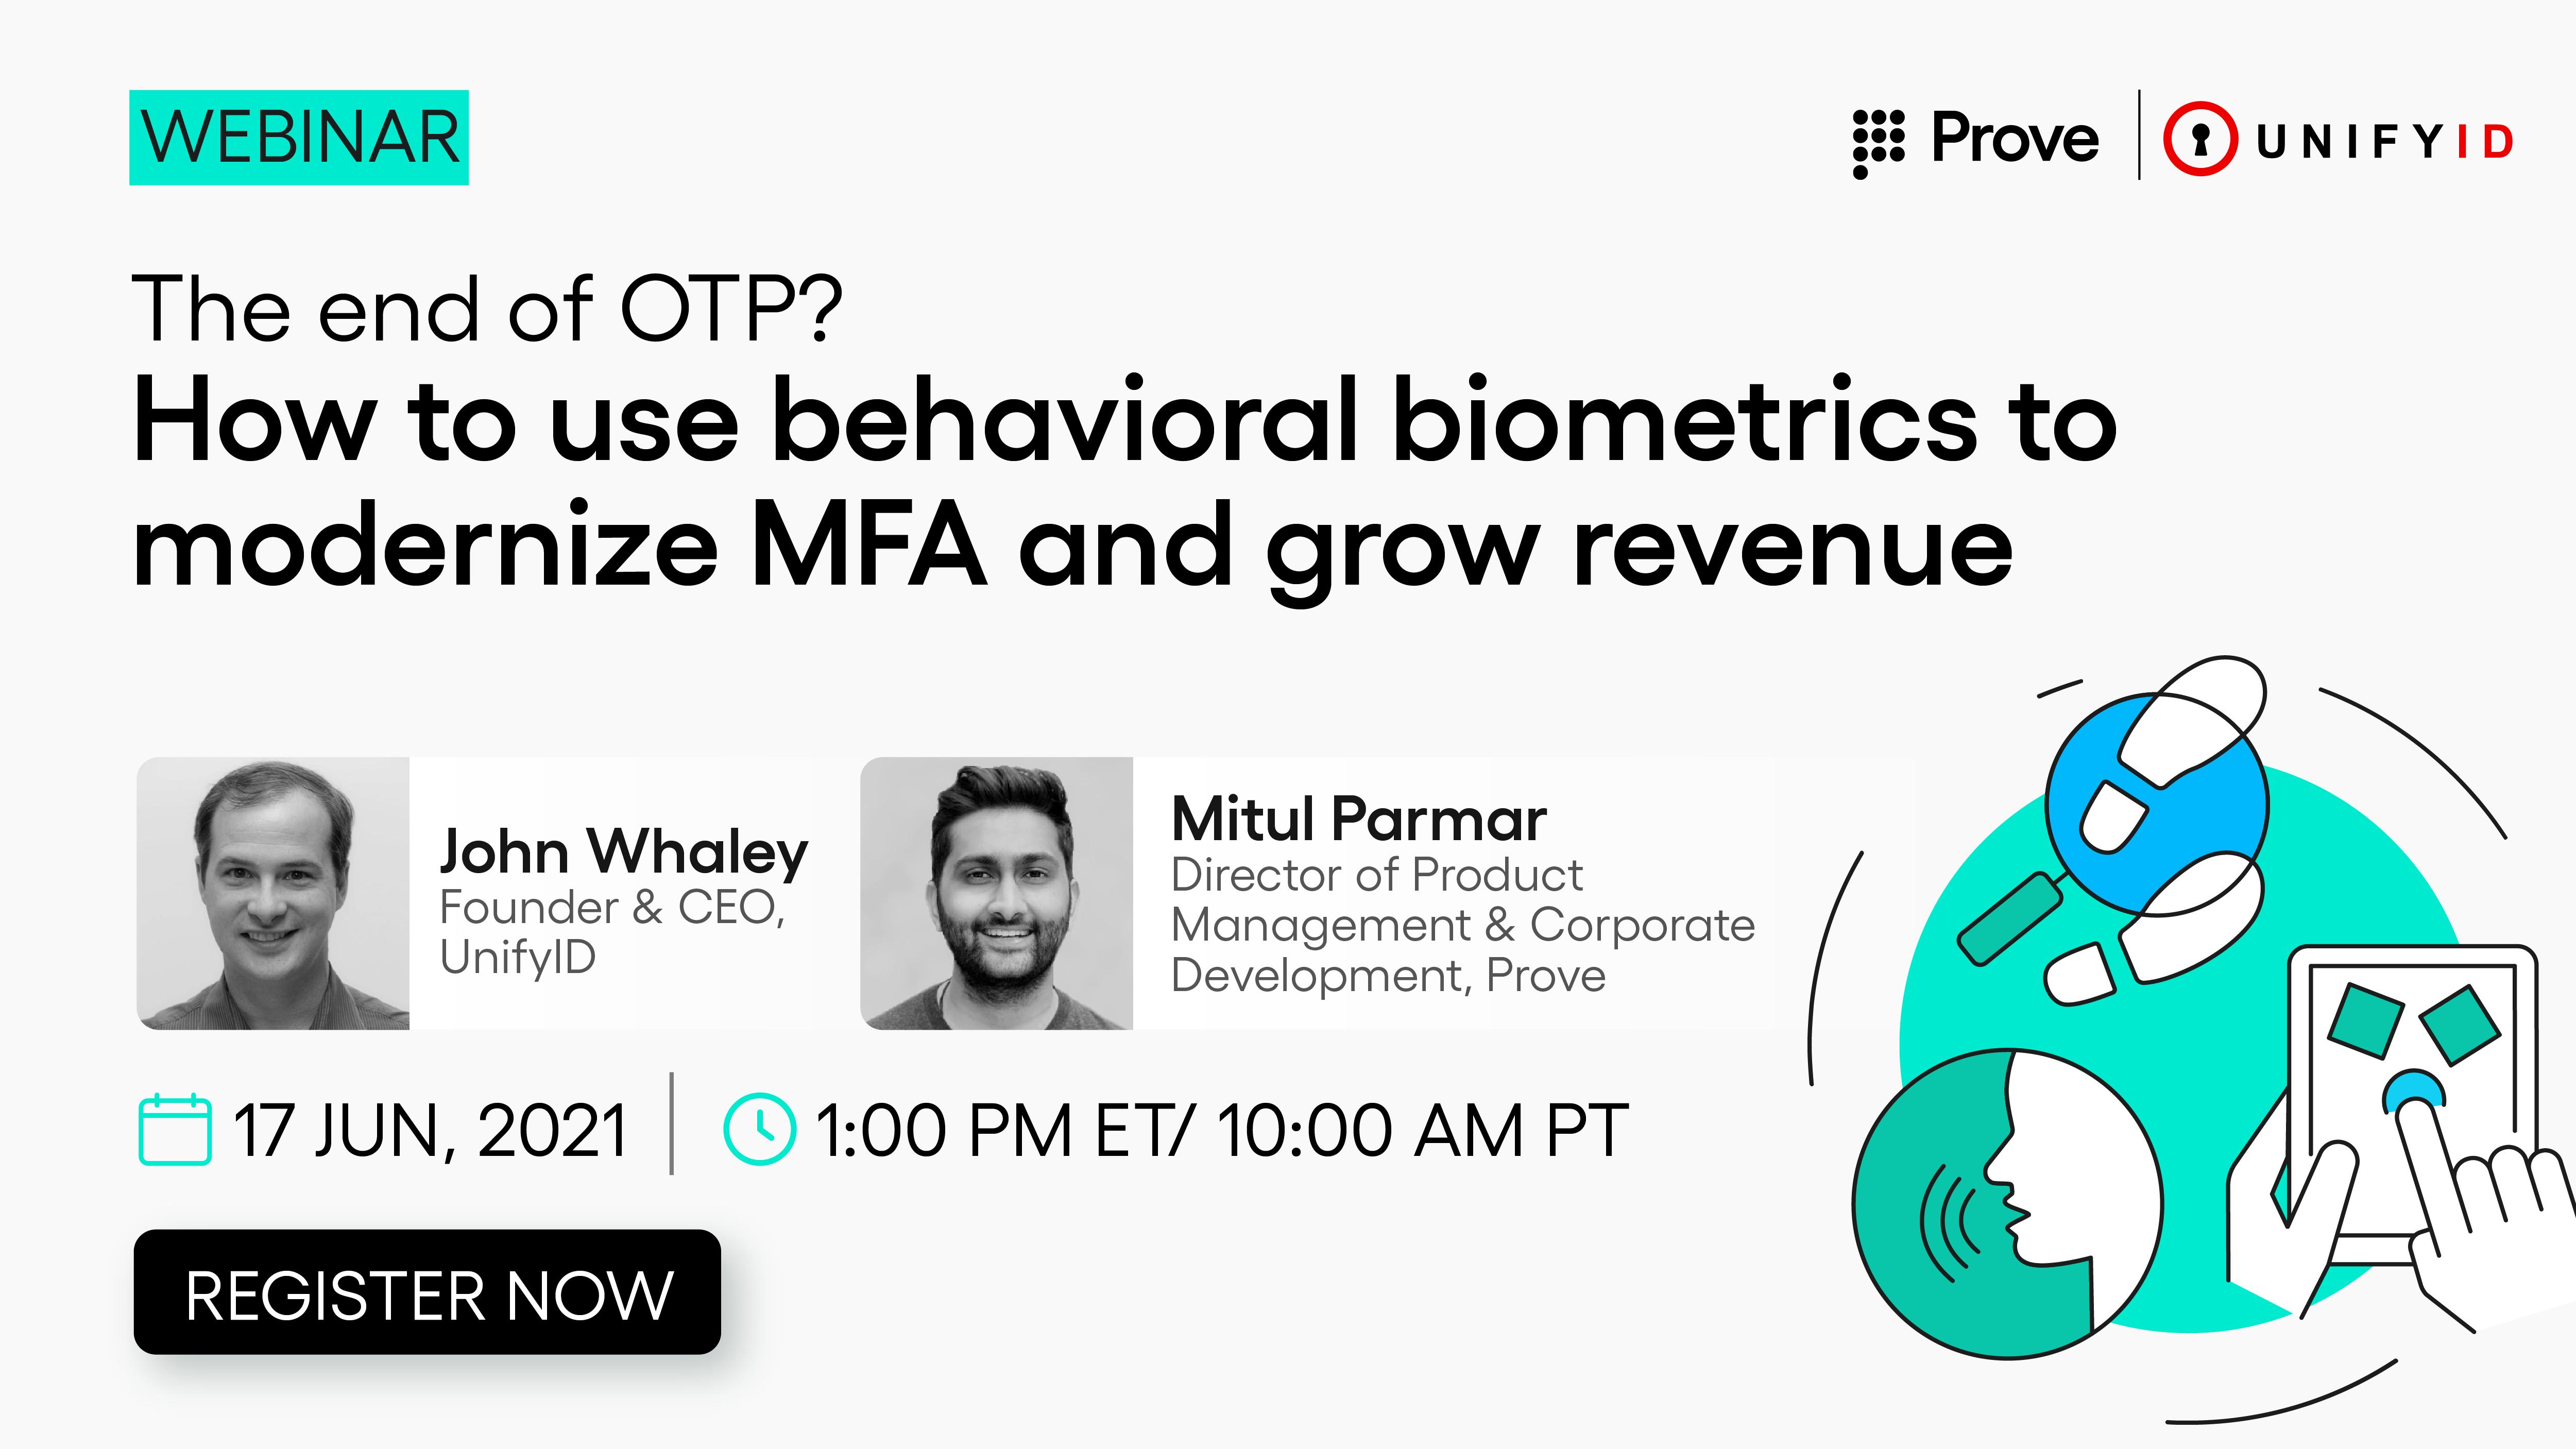 The End of OTP? How to Use Behavioral Biometrics to Modernize MFA and Grow Revenue